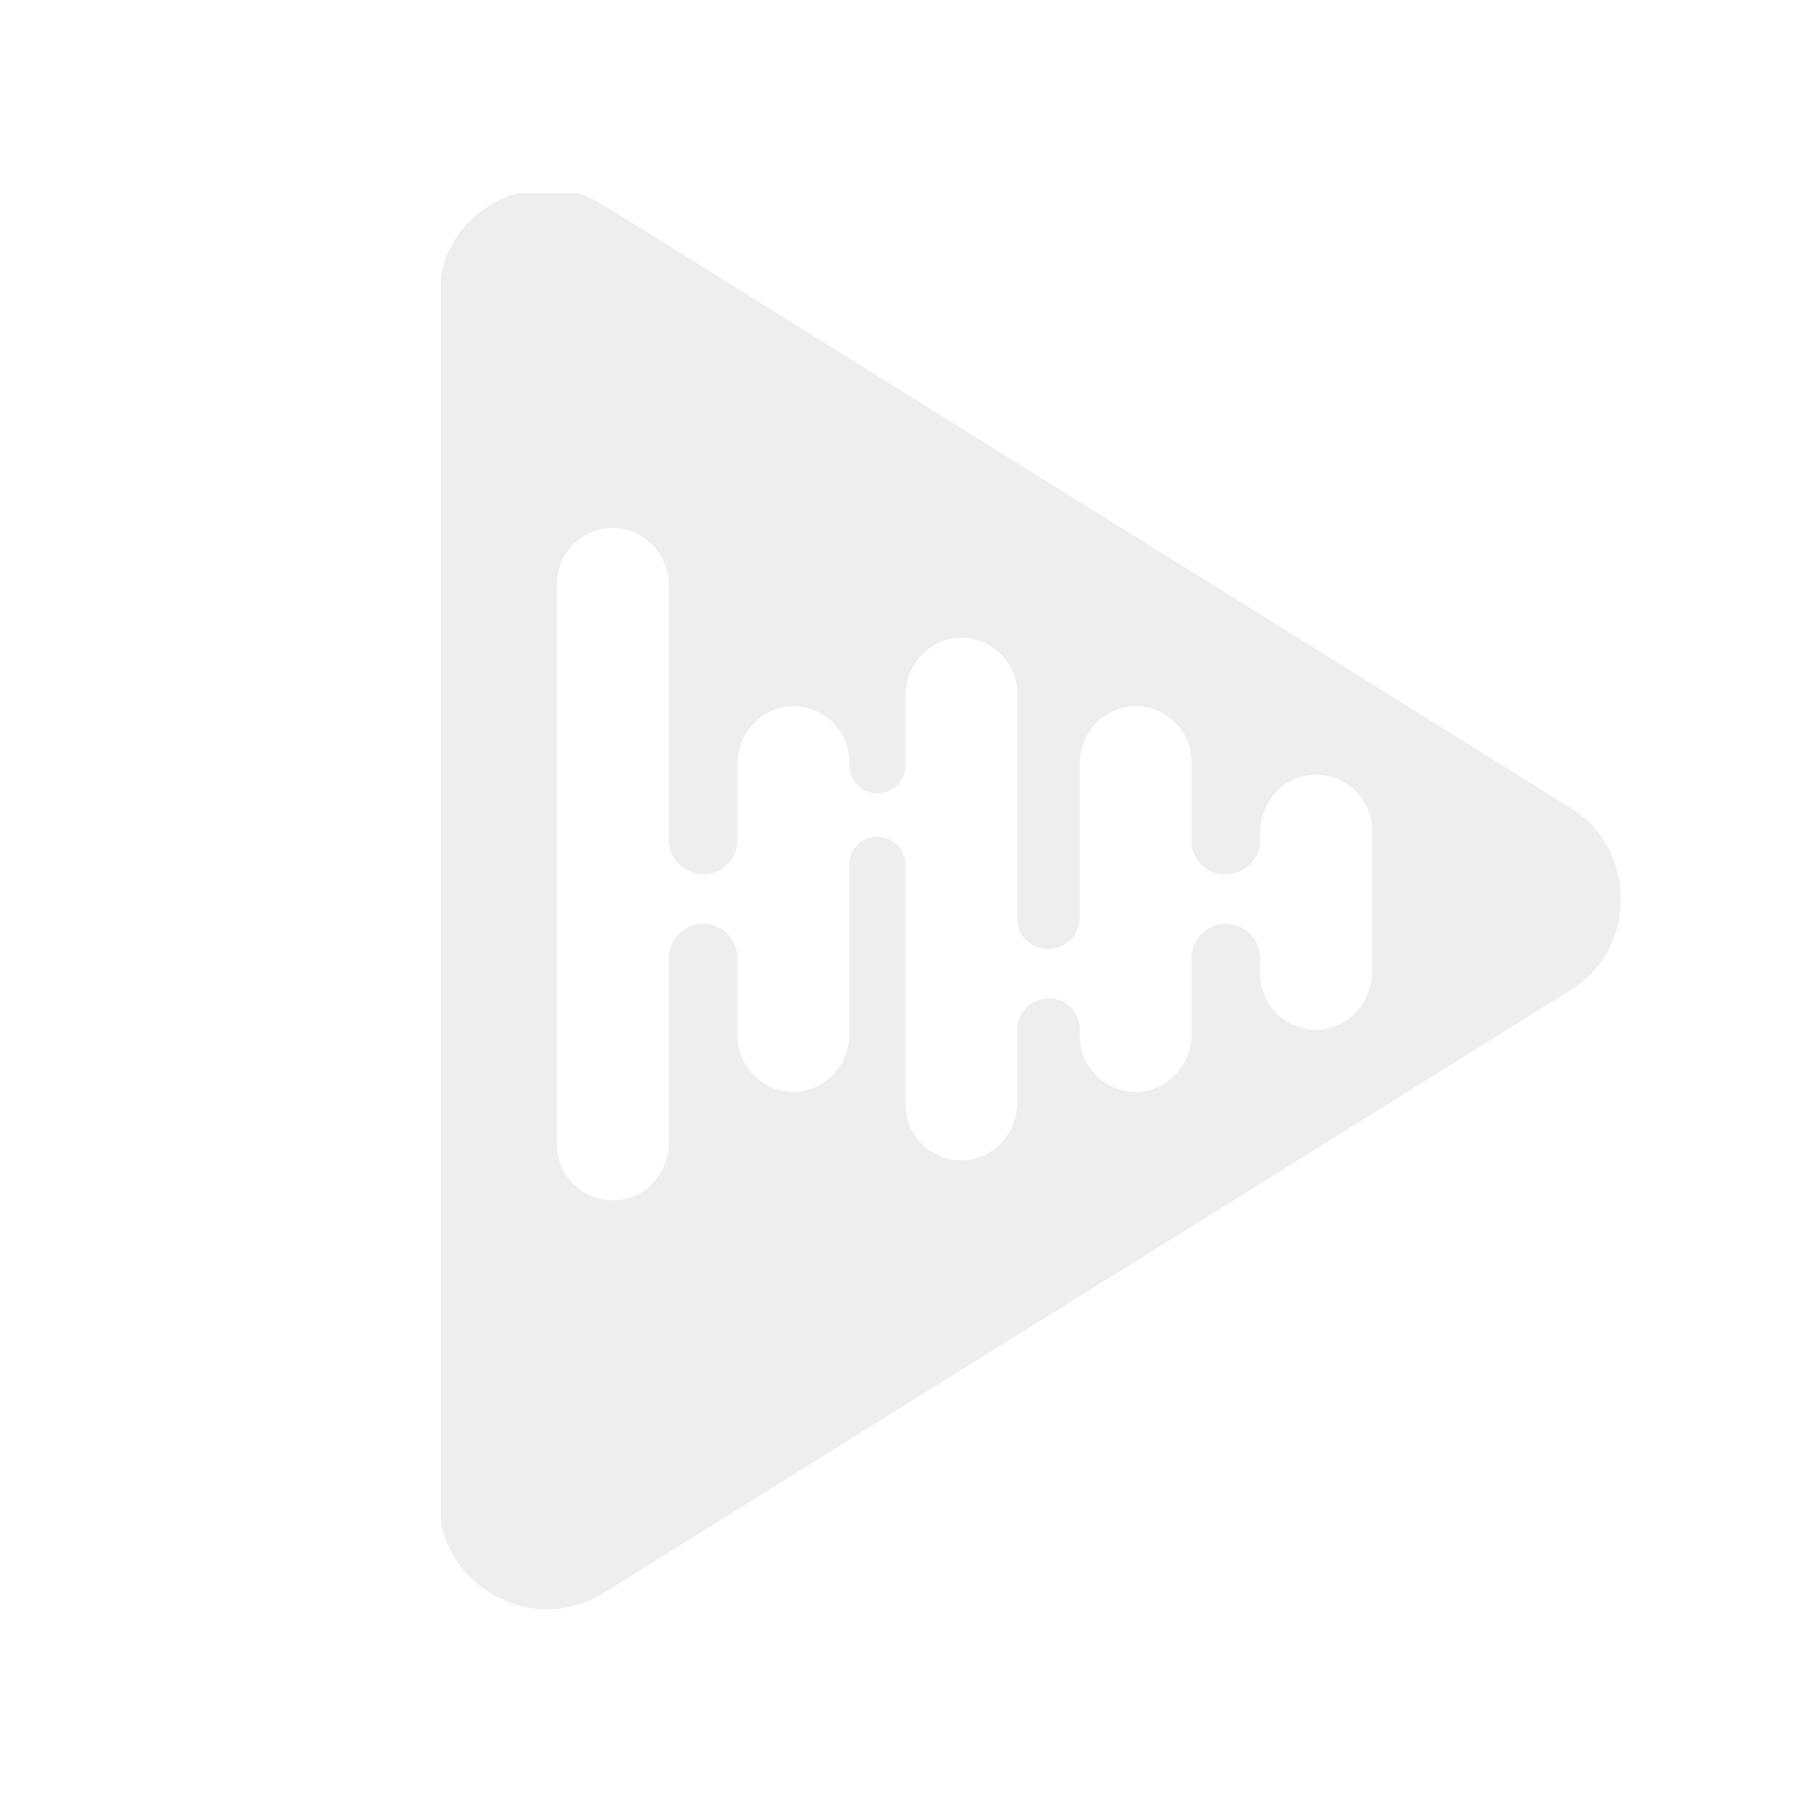 Klipsch 1012217 - RS-52 II delefilter /m terminal (Stk)